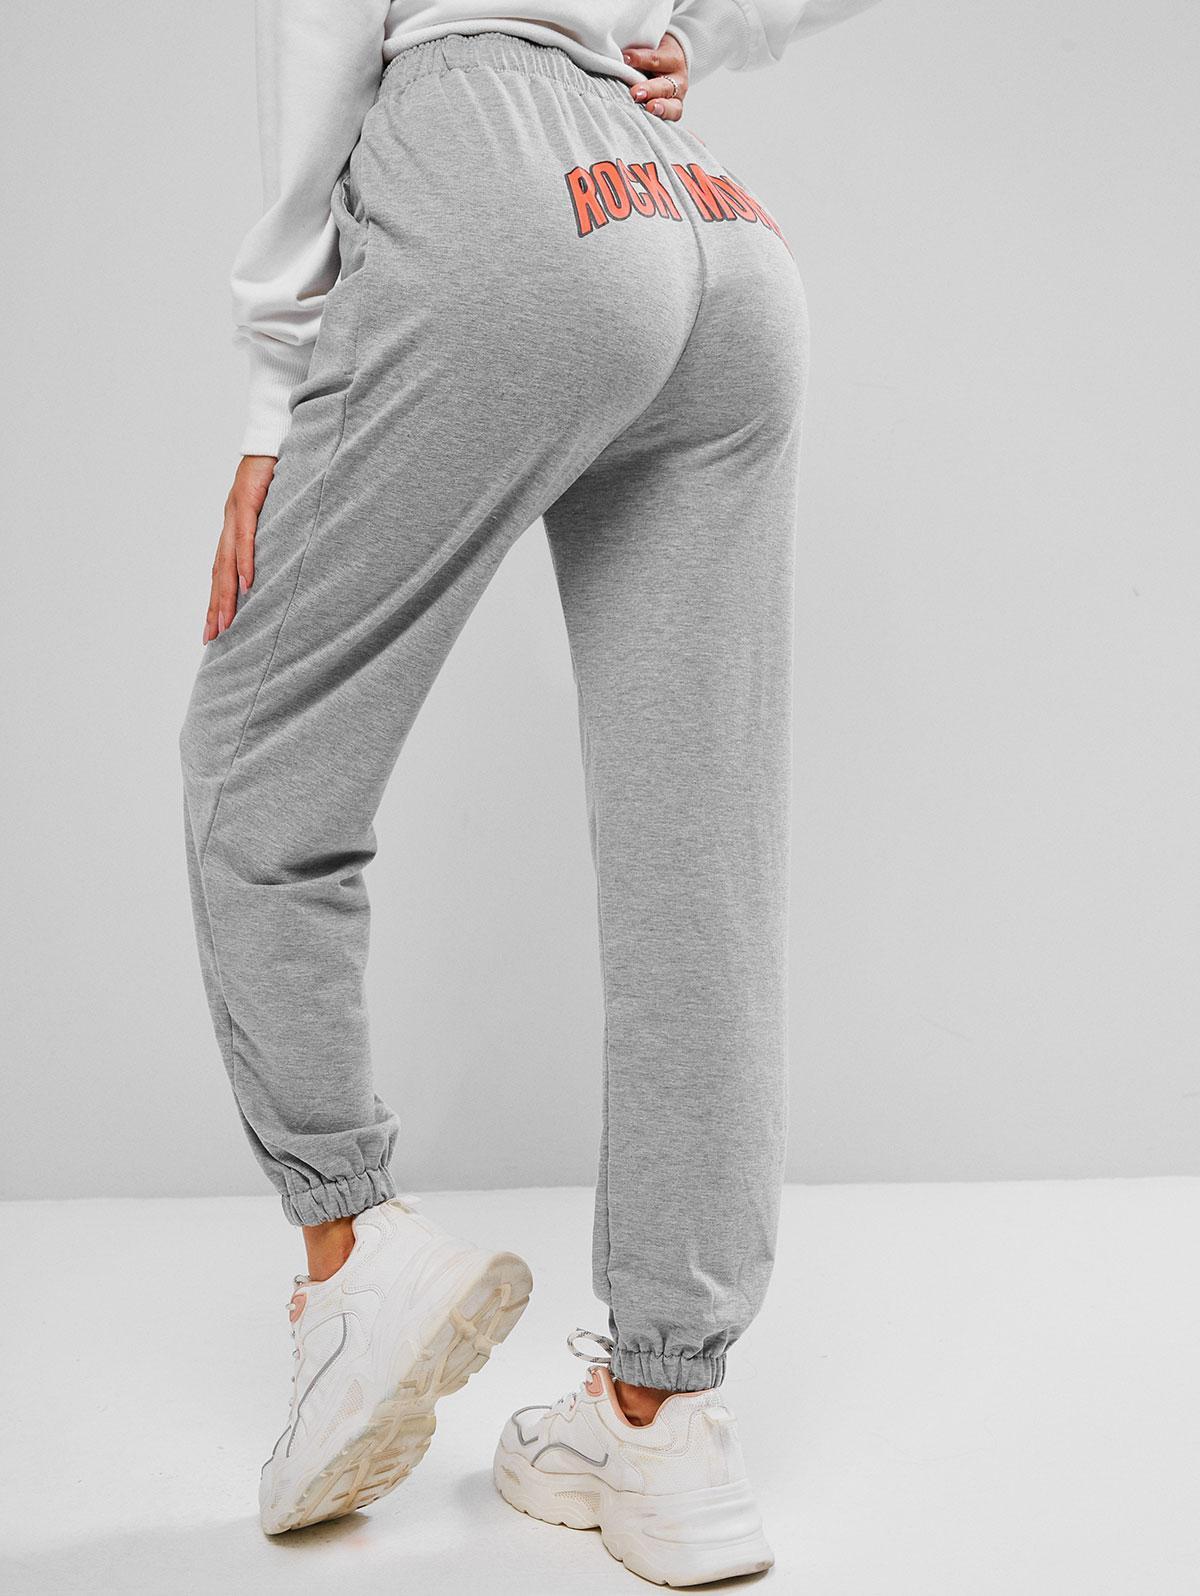 Pantalon de Jogging Graphique avec Poche L - Zaful FR - Modalova